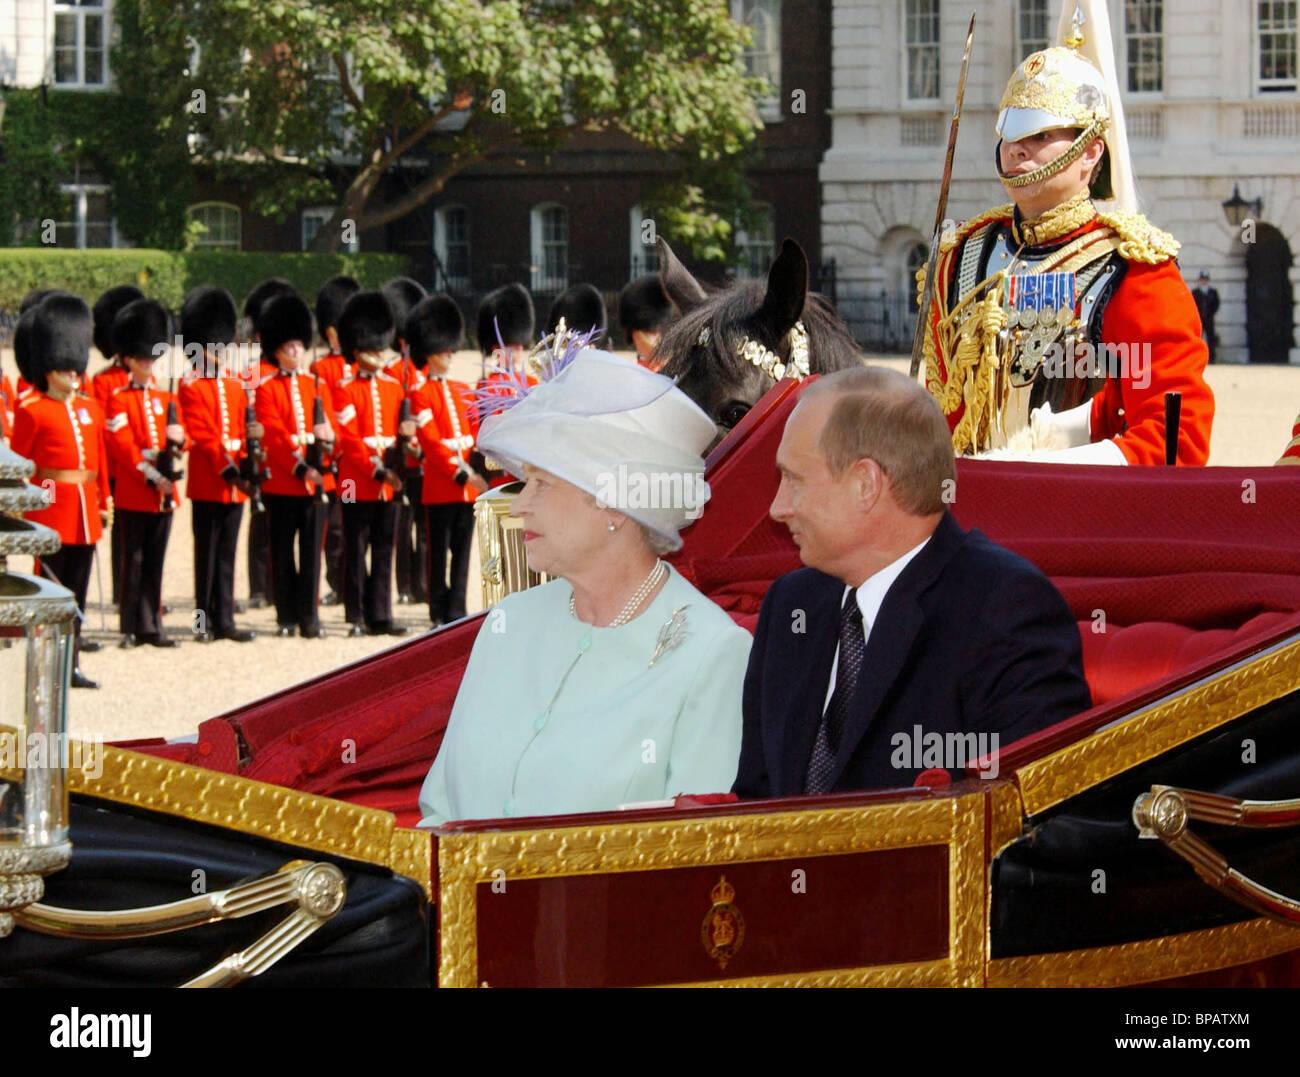 Putin's visit to Great Britain - Stock Image